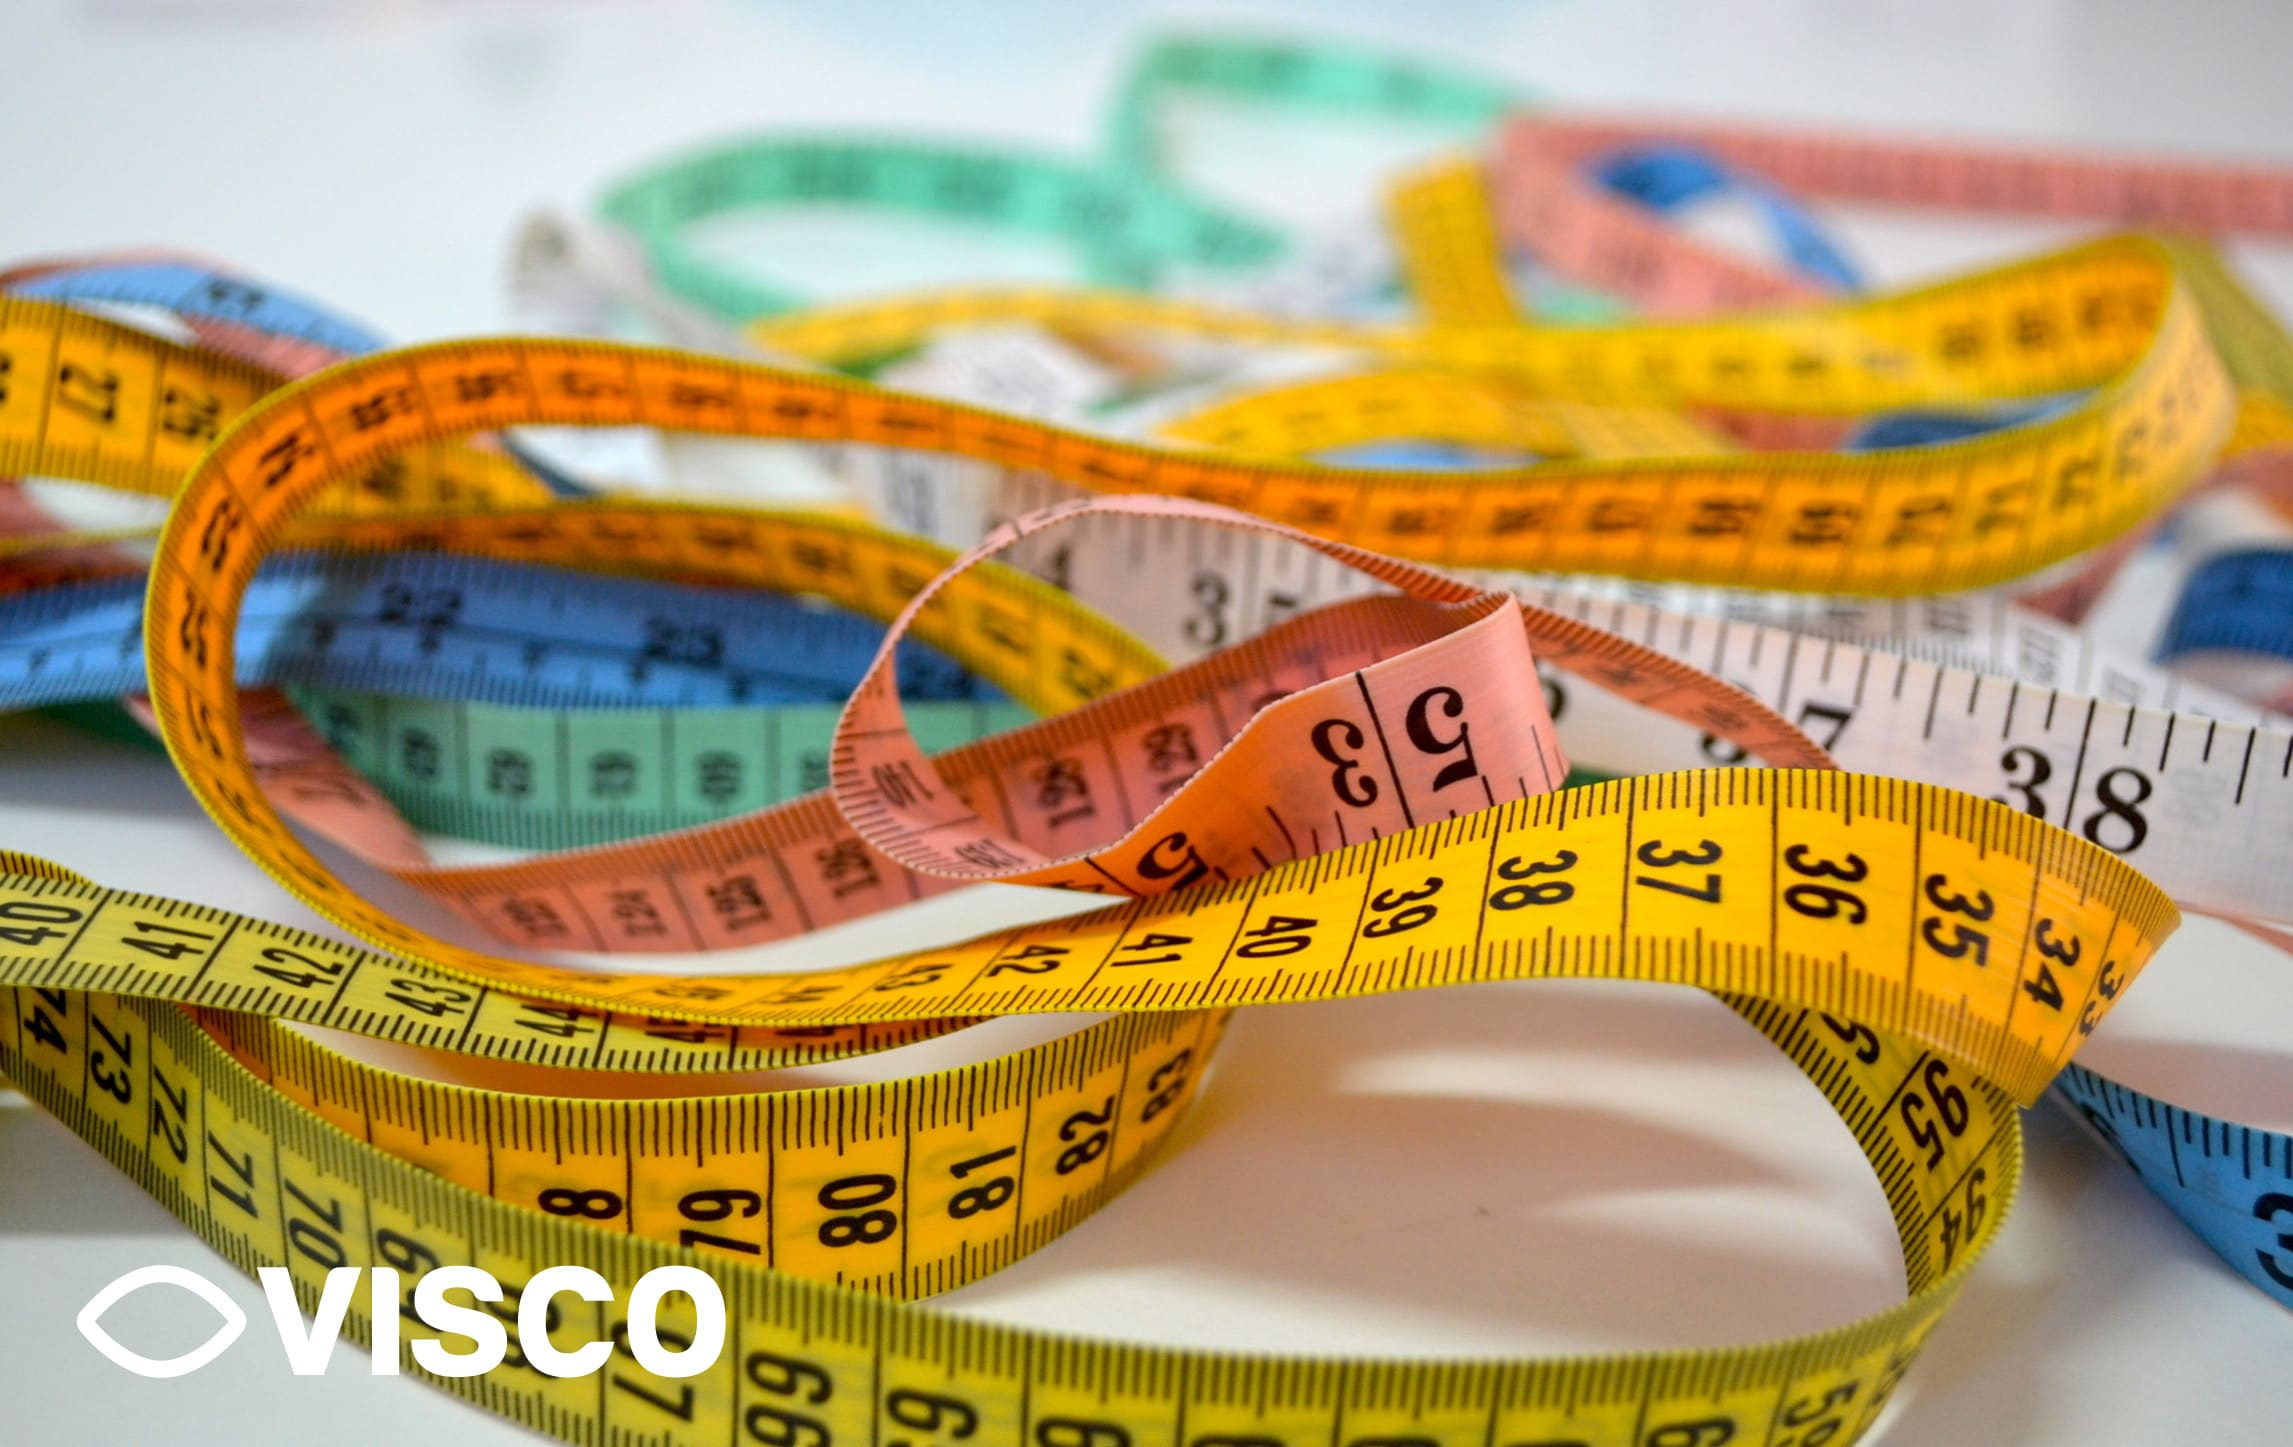 Visco Measurement Guide